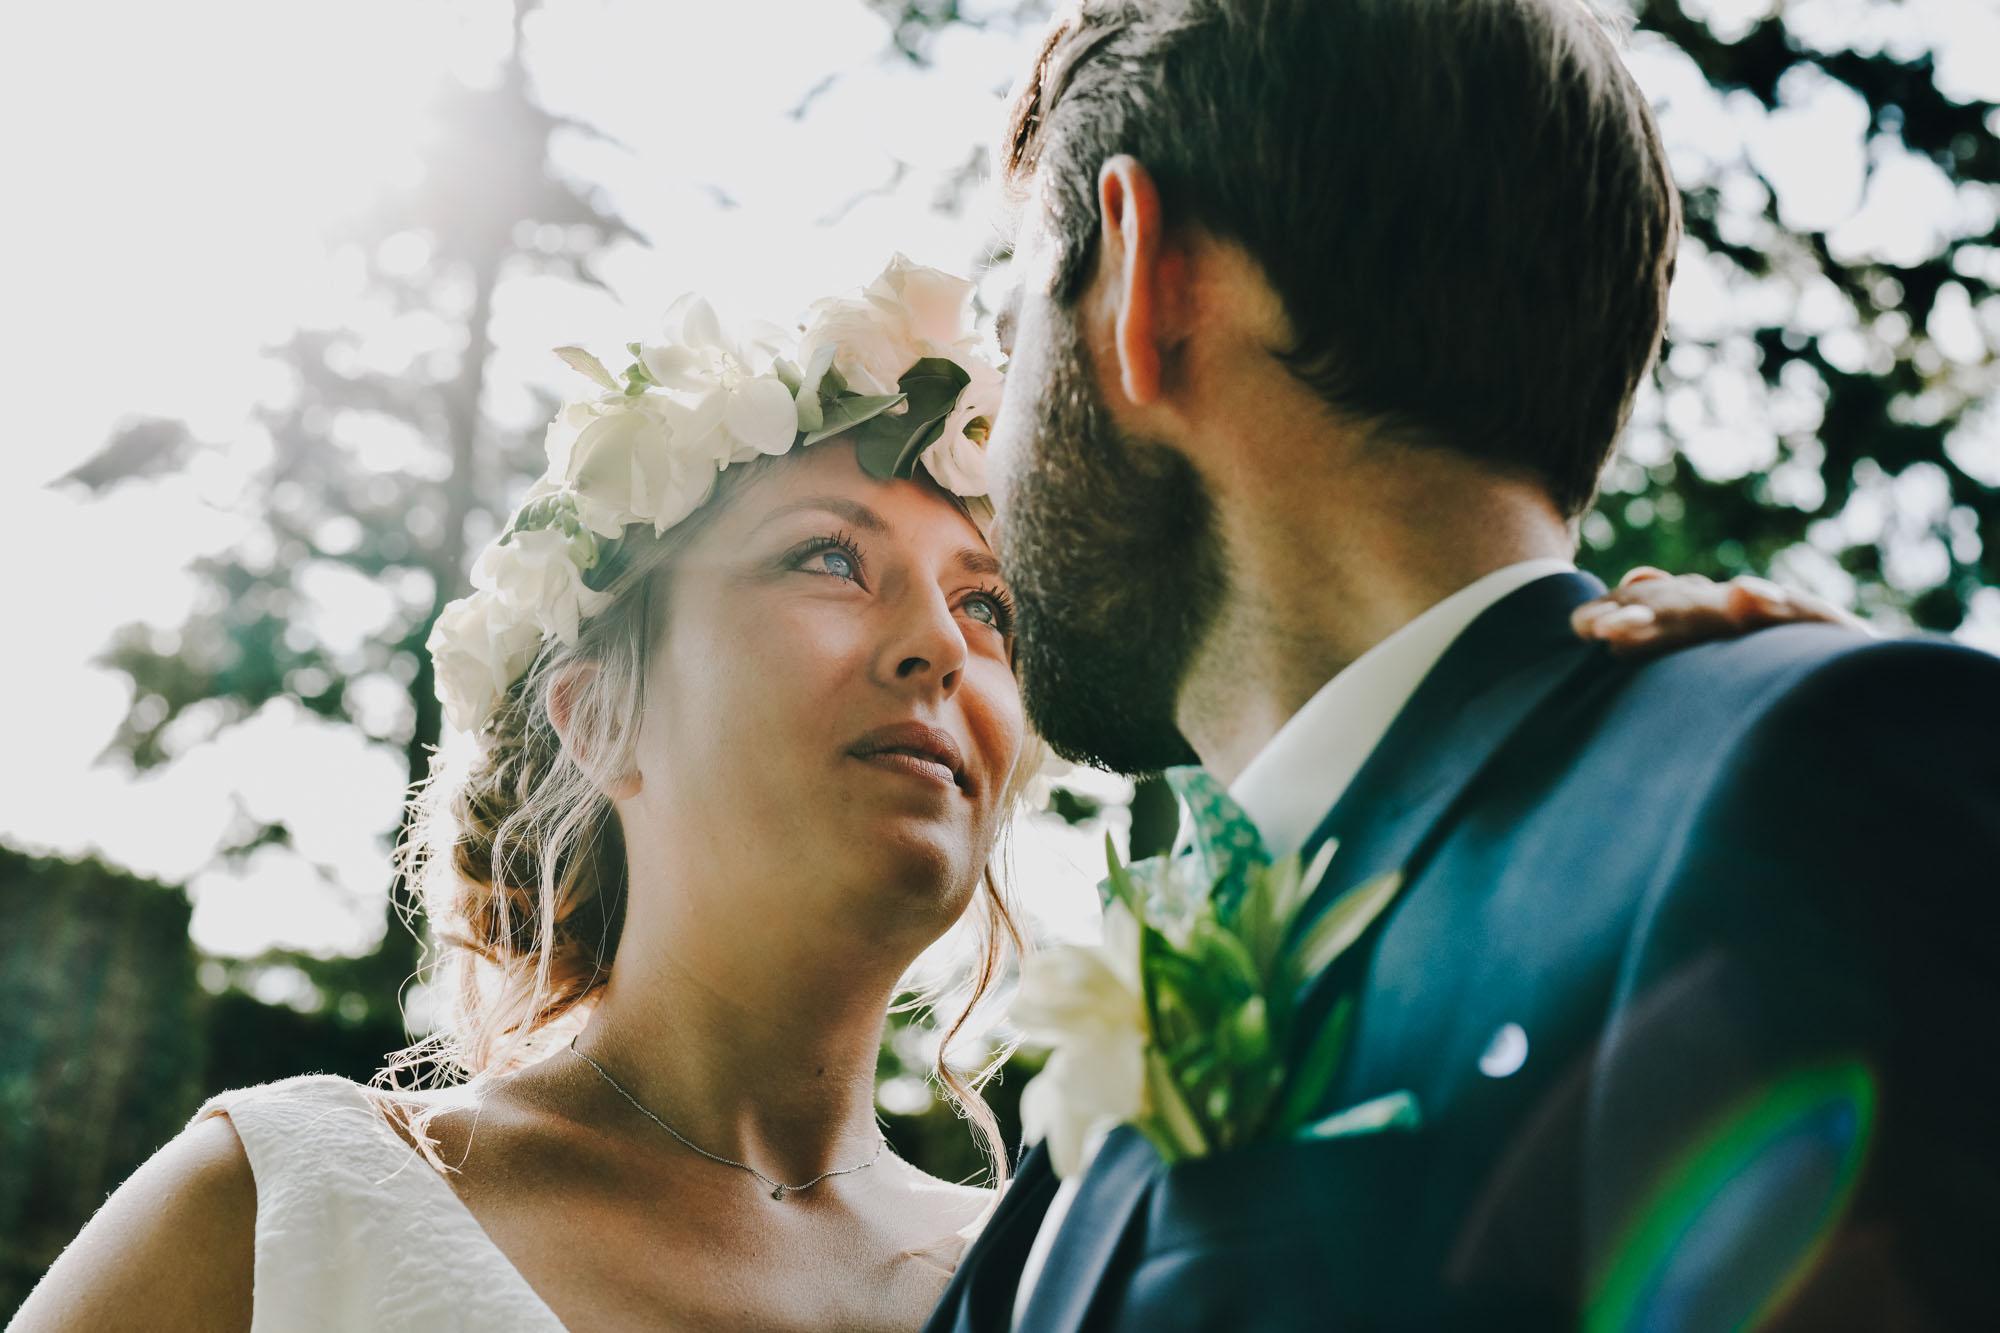 2018-07-21 - LD8_0188 - photographe mariage lyon - laurie diaz - www.lauriediazweeding.com.jpg